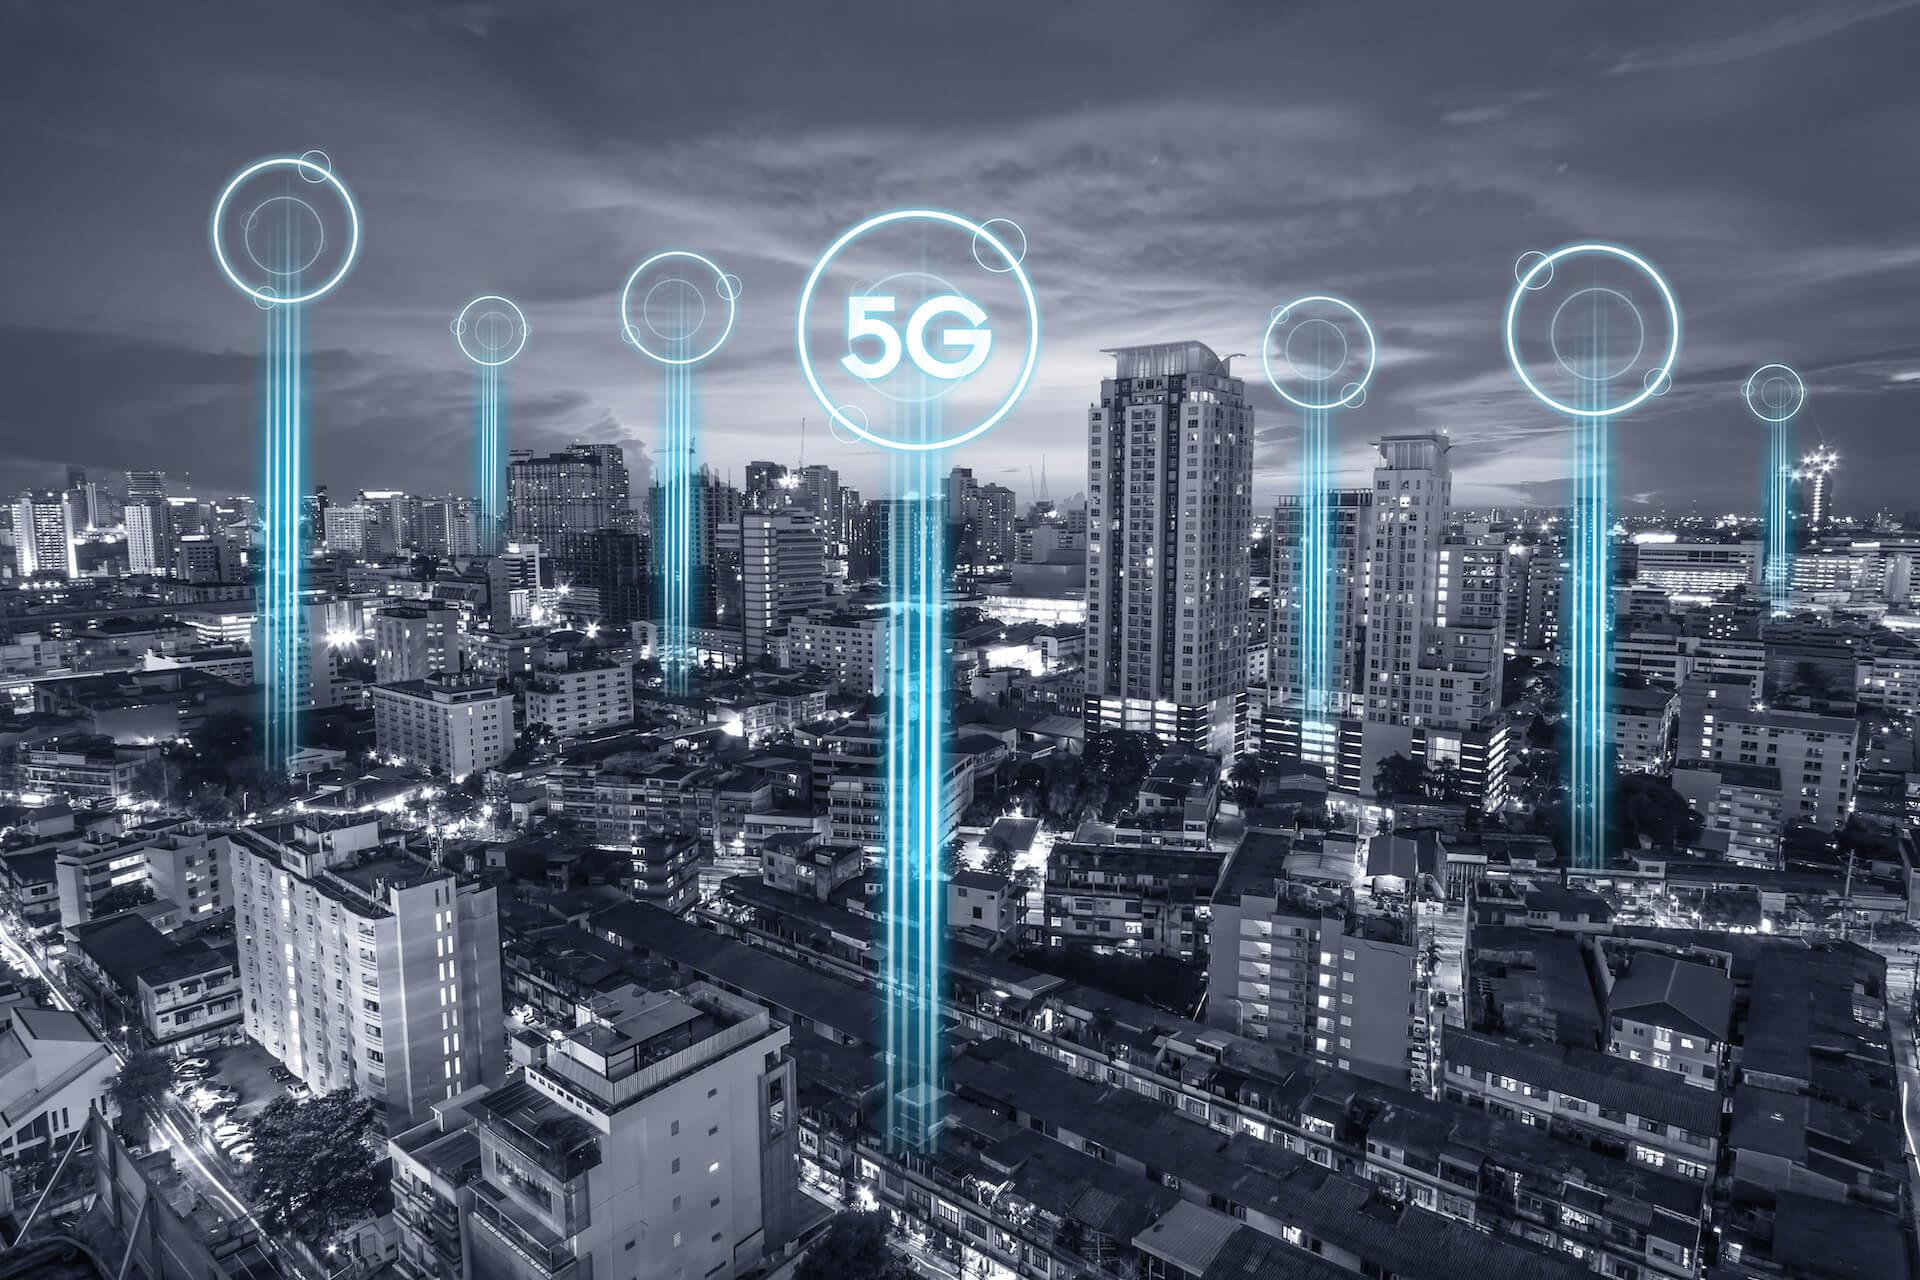 5g-communication-network-connection-internet